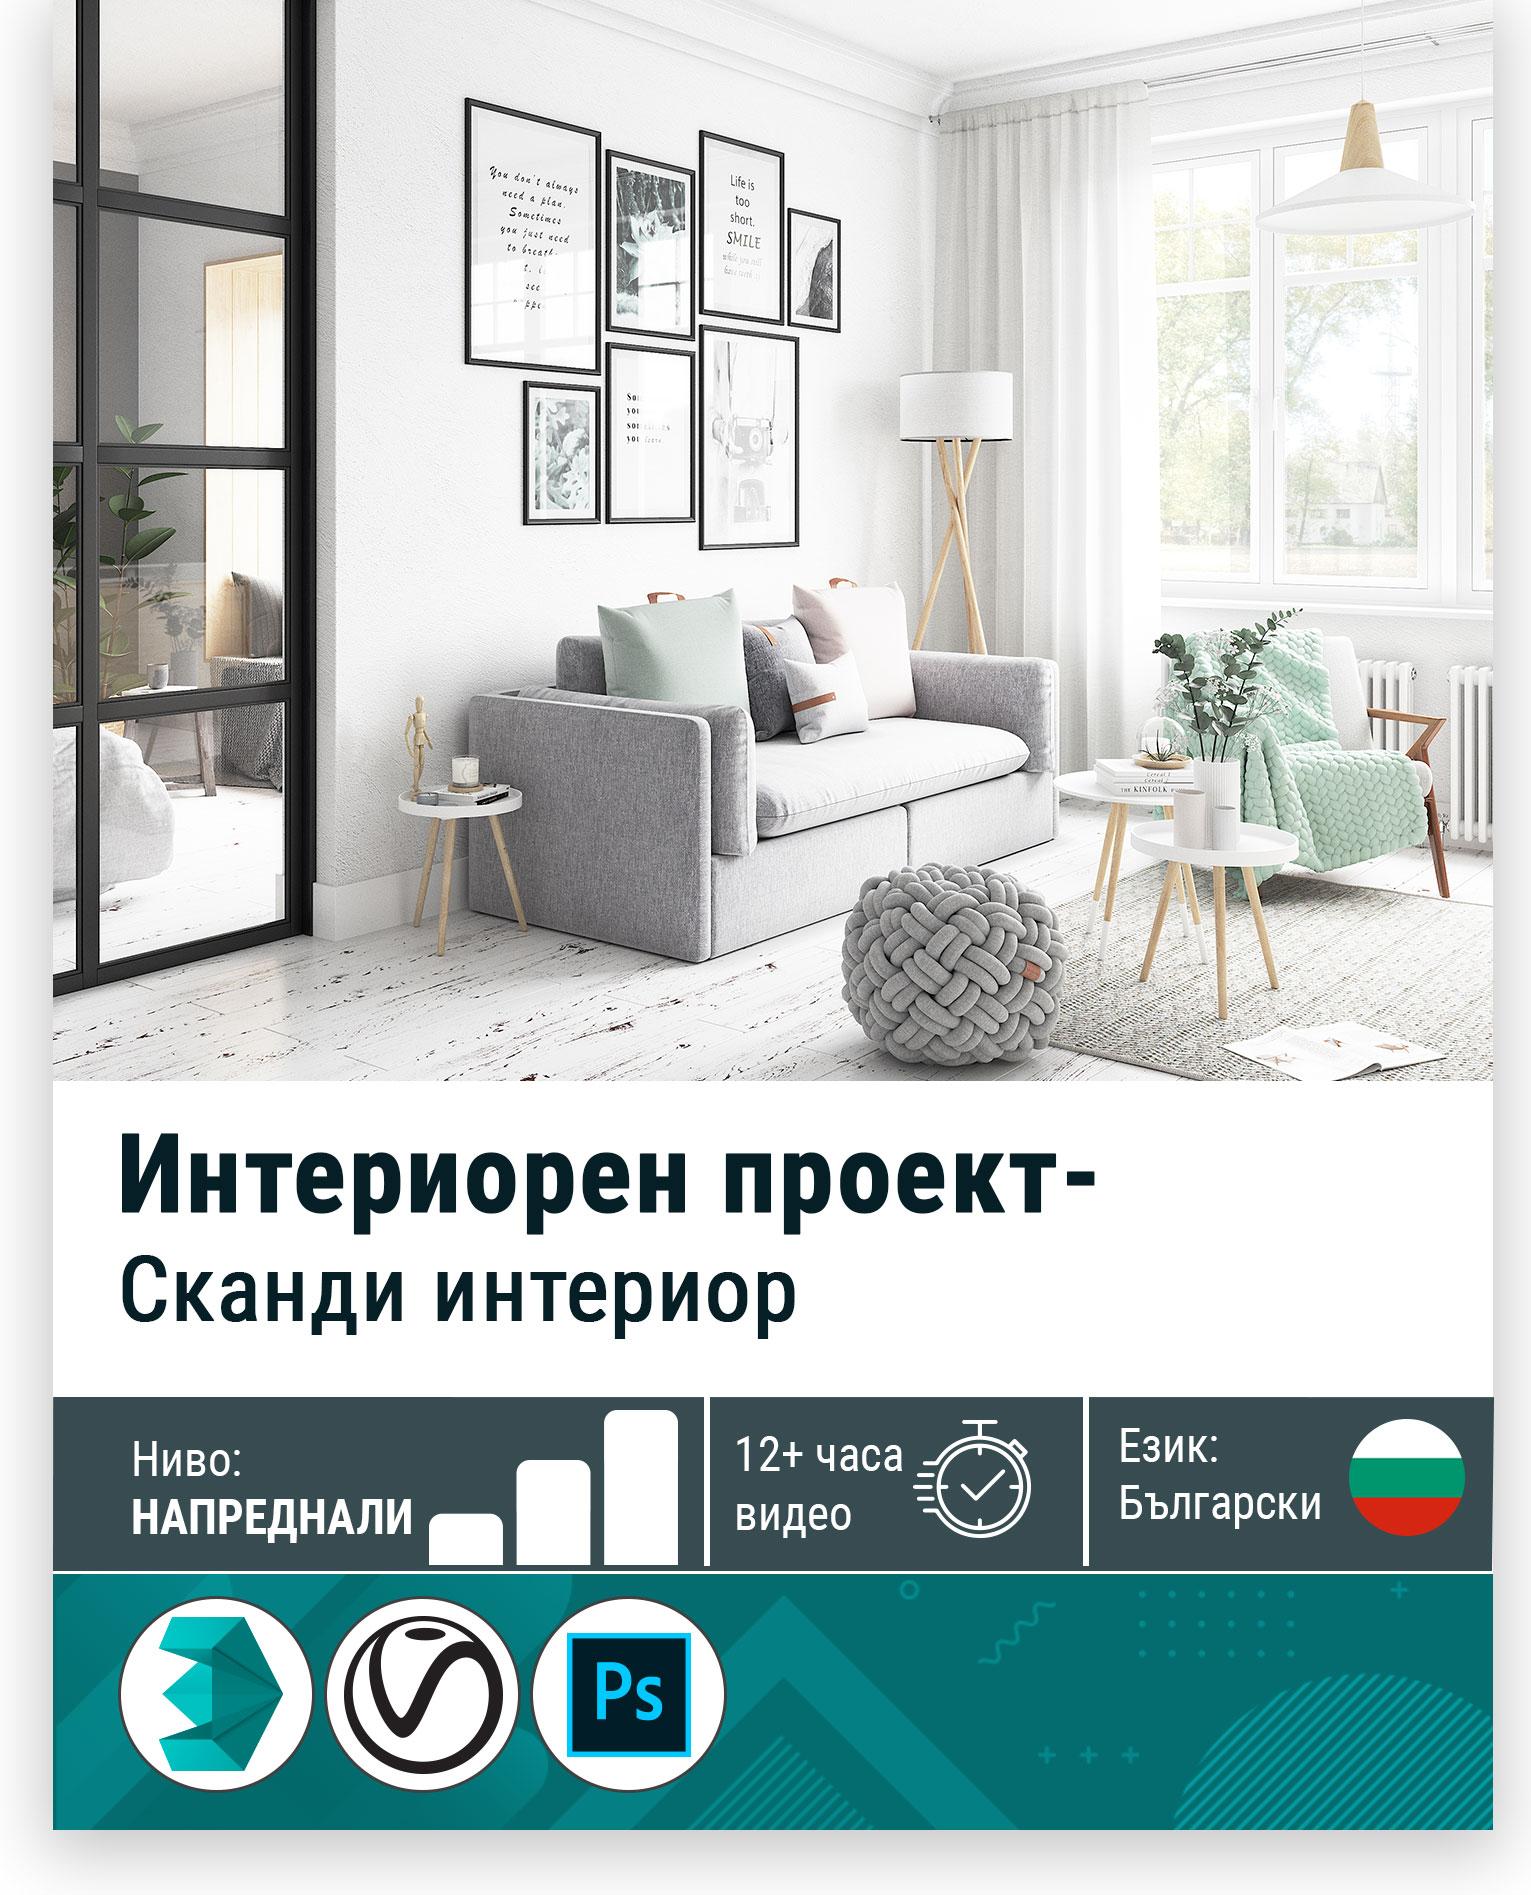 Course_Cover_Interioren_Proerkt_Scandi_Interior